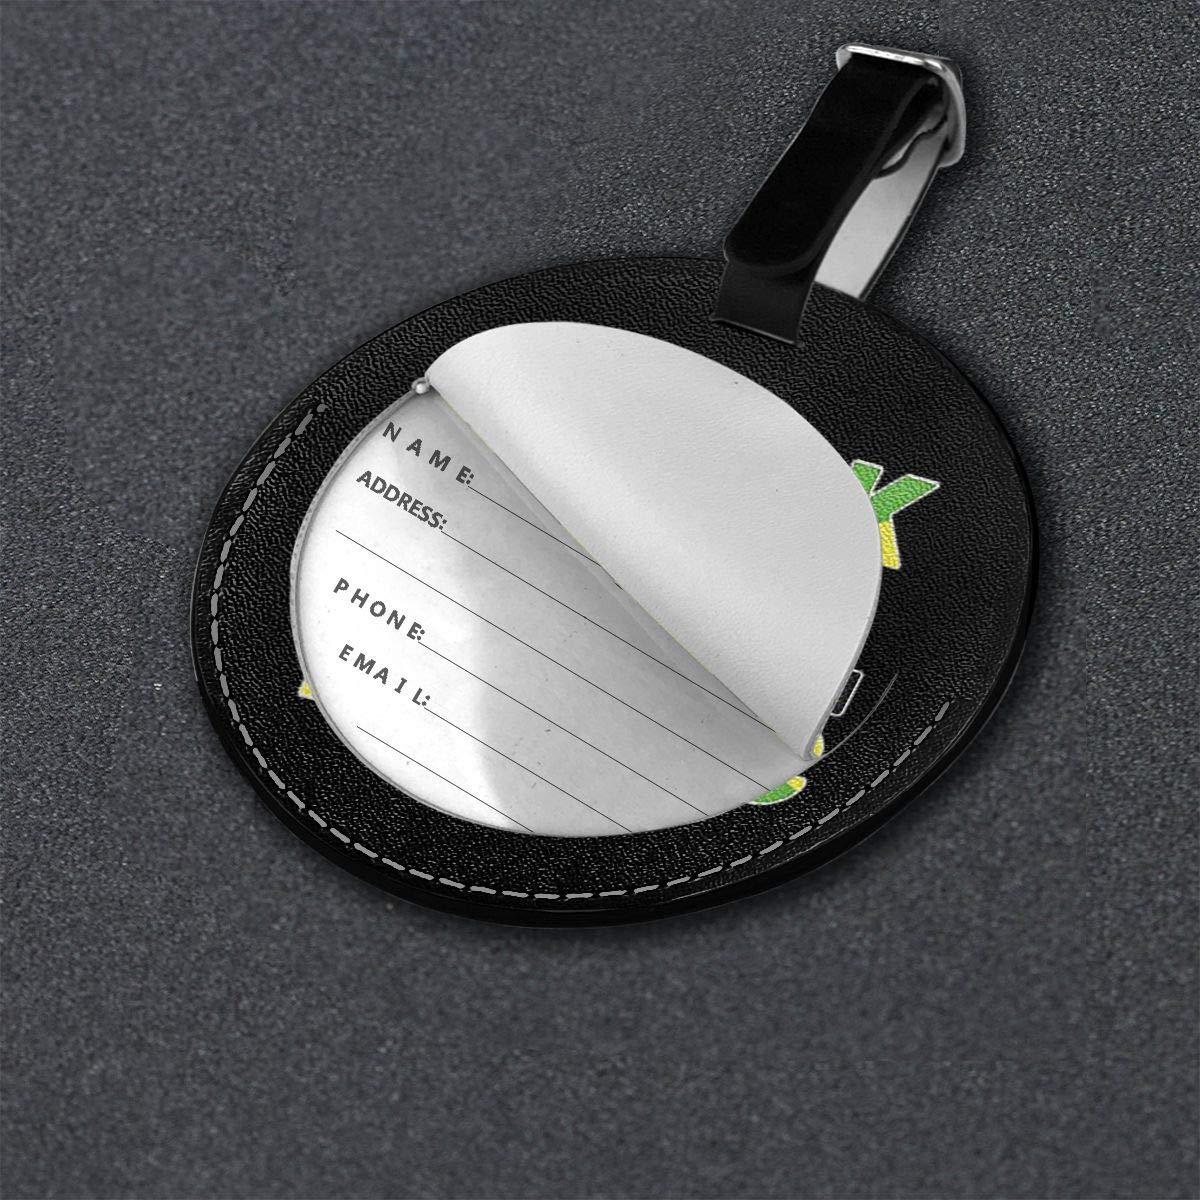 Free-2 Black Girl Magic Jamaica Flag Luggage Tag 3D Print Leather Travel Bag ID Card